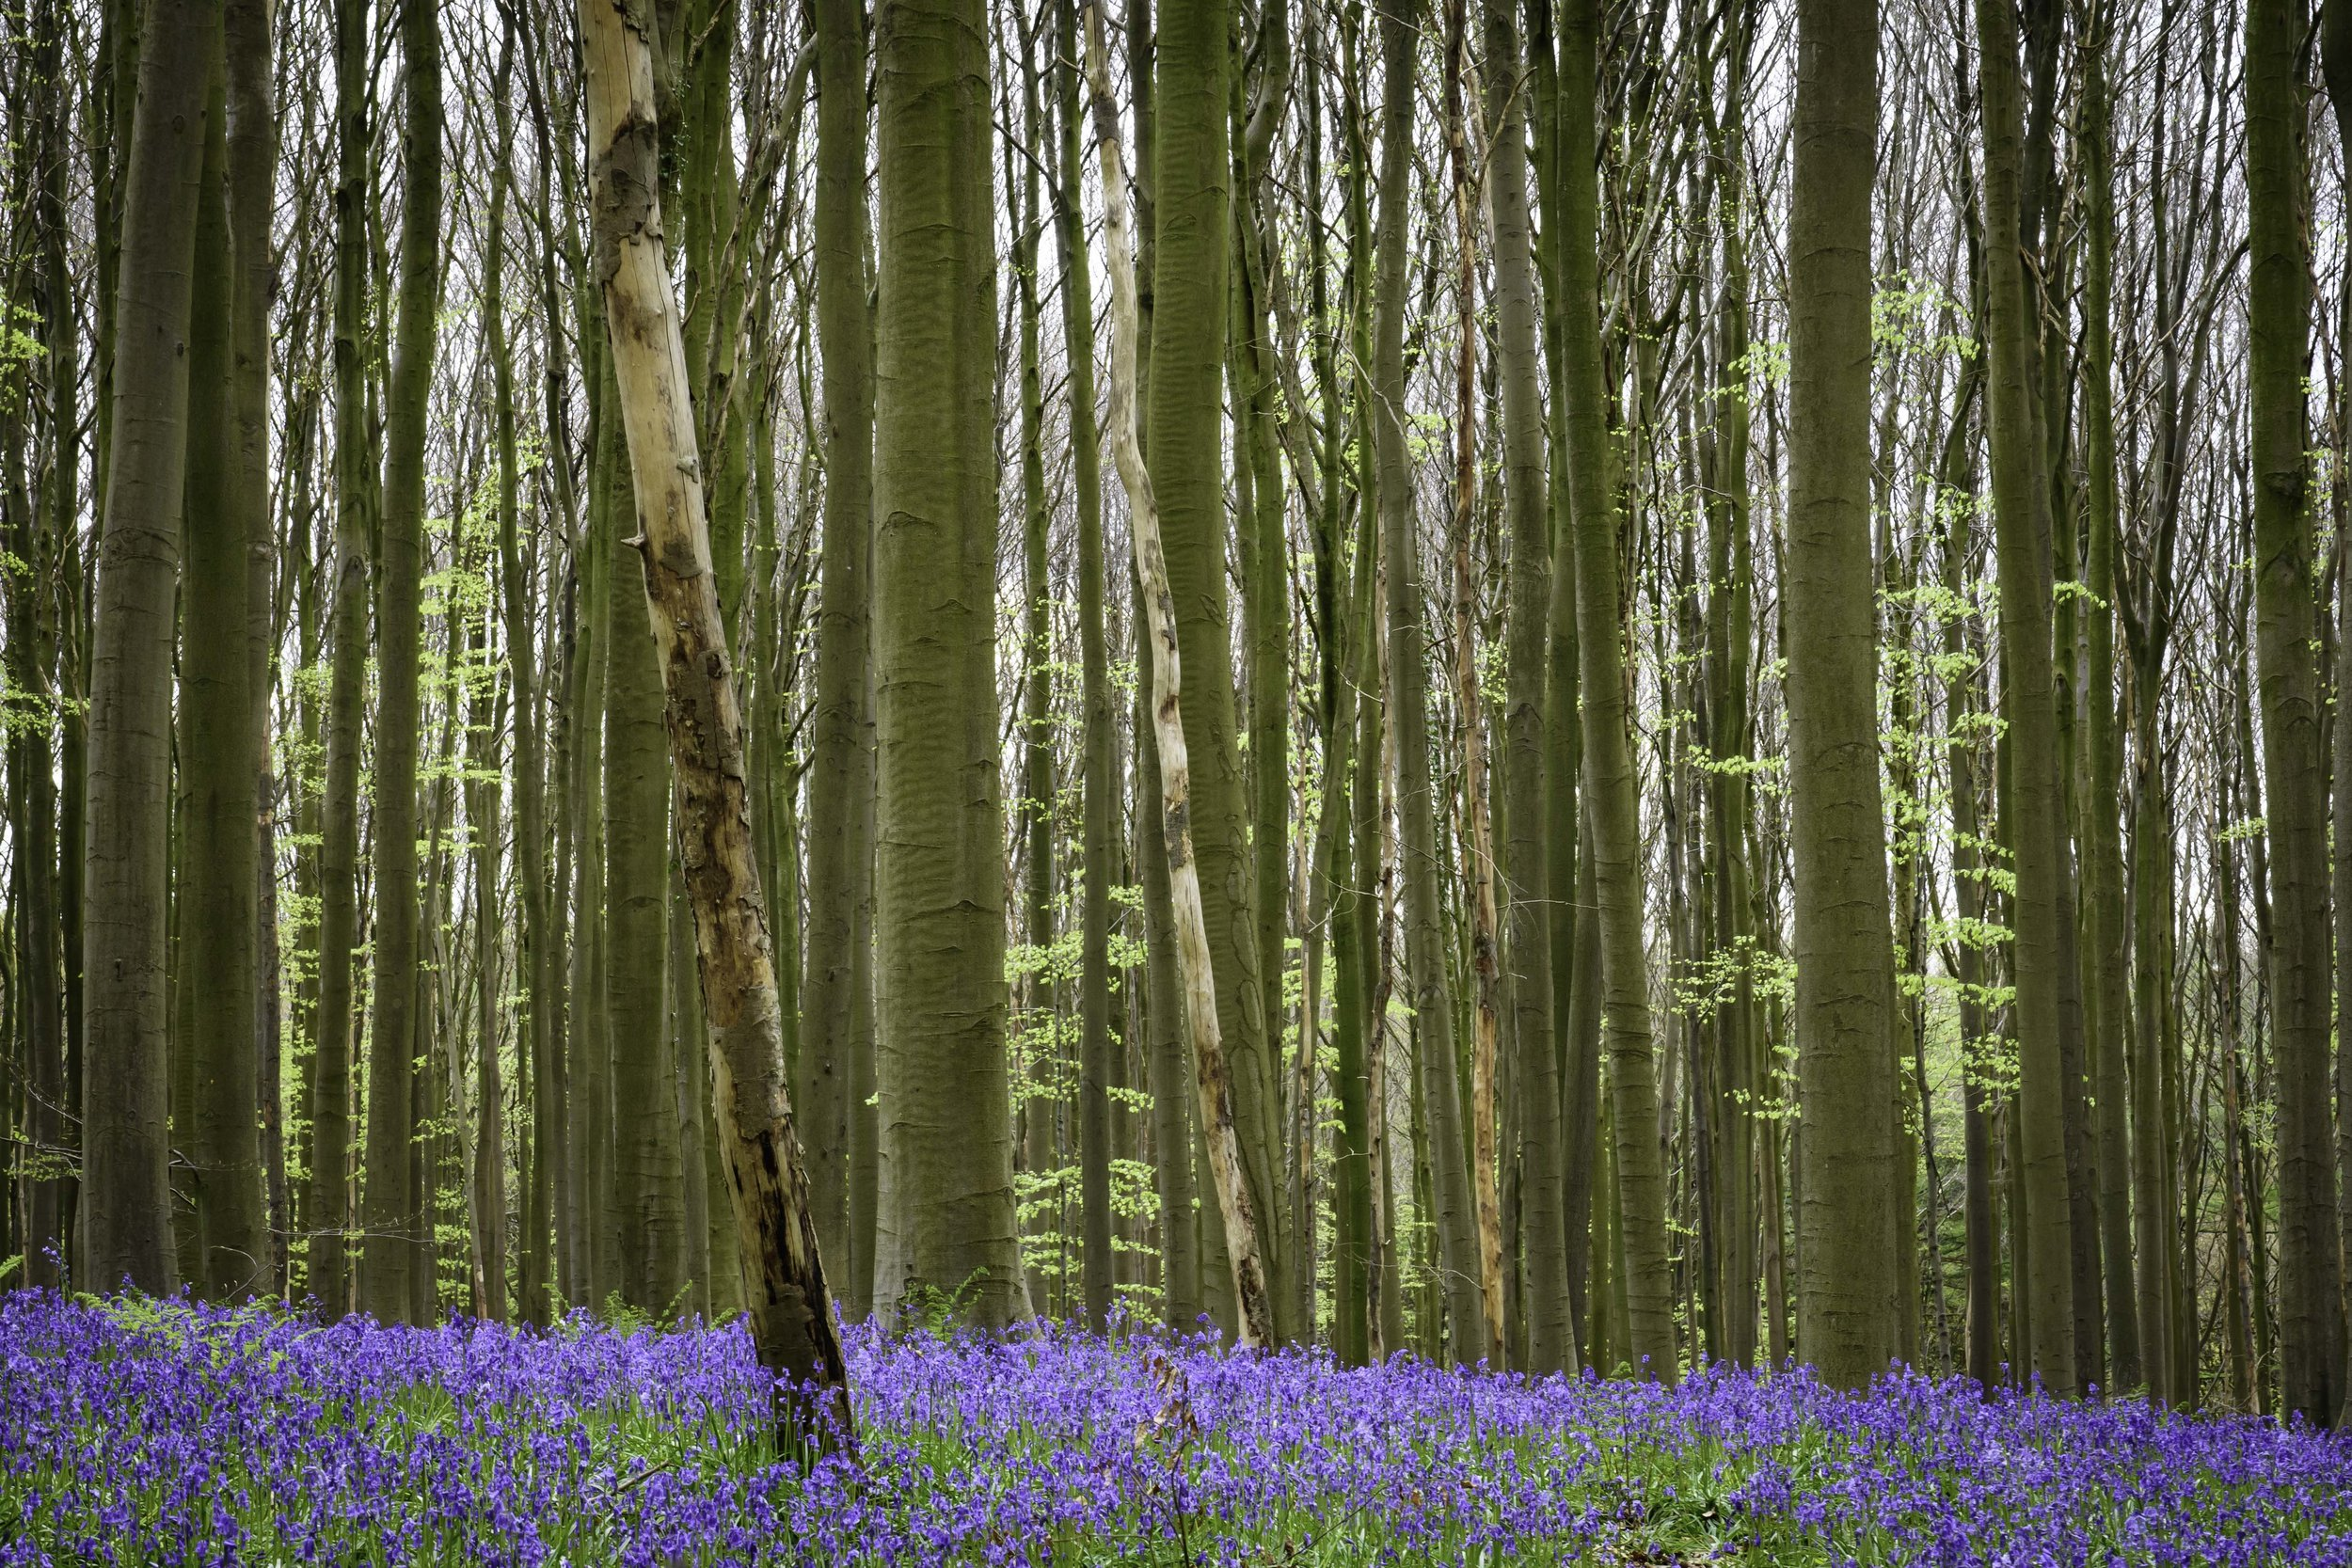 viewfinder-blauwe-hallerbos-fotograferen-tips-natuurfotografie-3